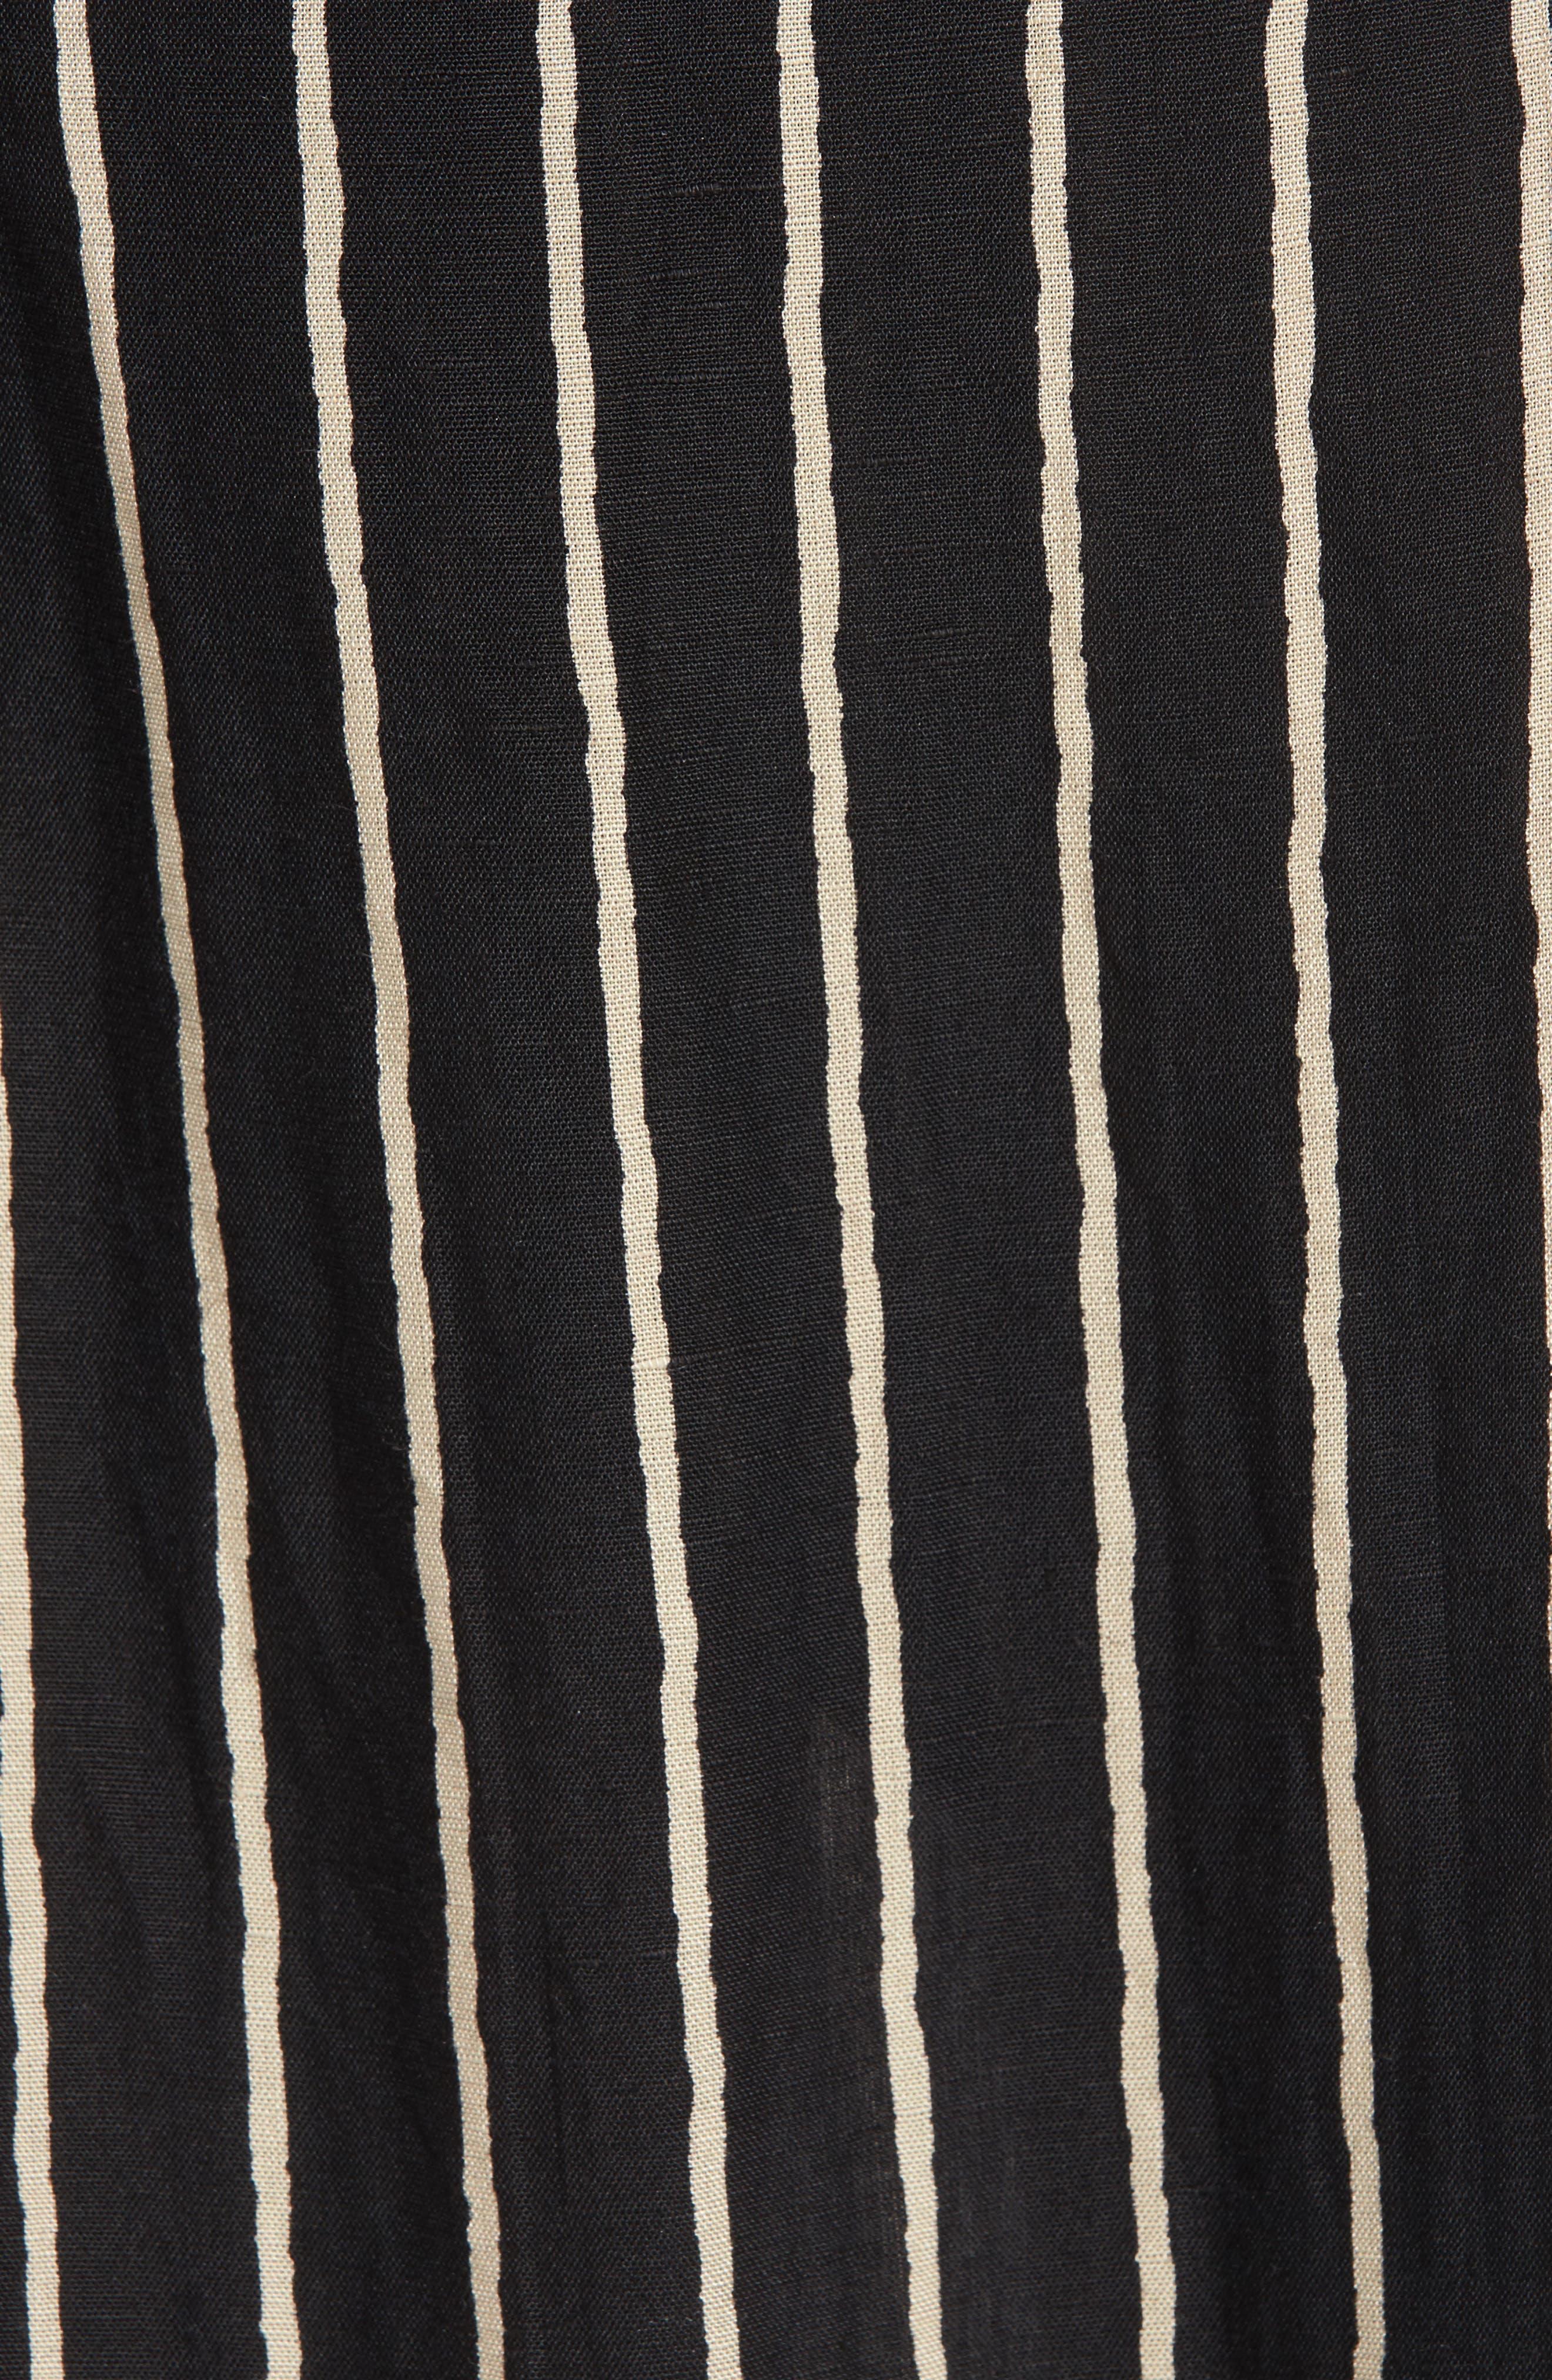 Strapless Faux Wrap Maxi Dress,                             Alternate thumbnail 6, color,